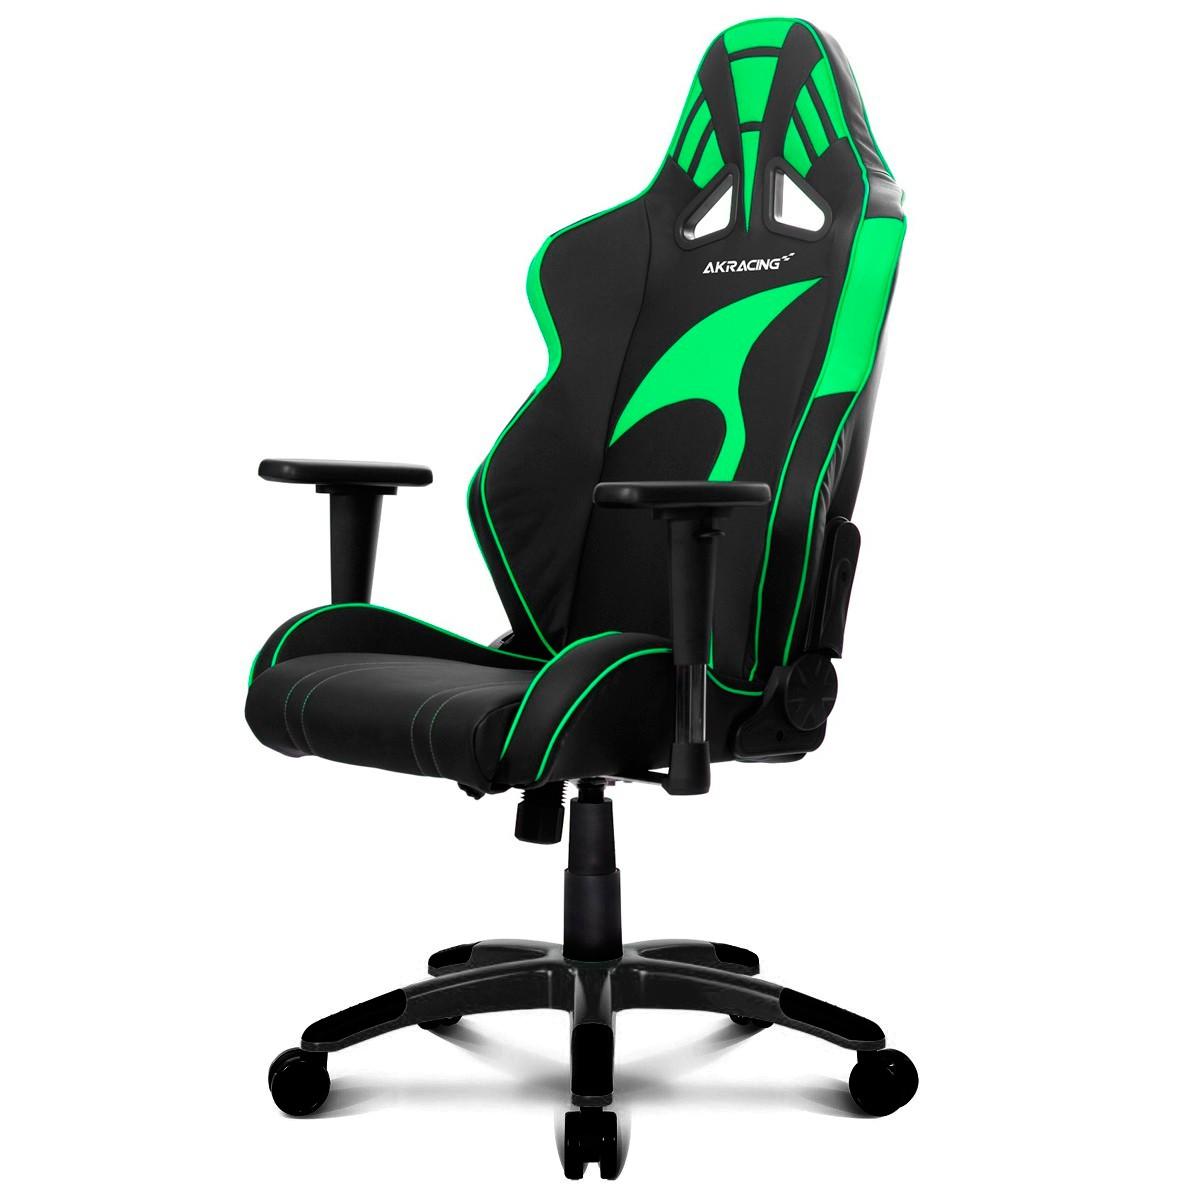 Comprar silla akracing ak 6013 bg negra verde en 4frags for Donde comprar una silla gamer